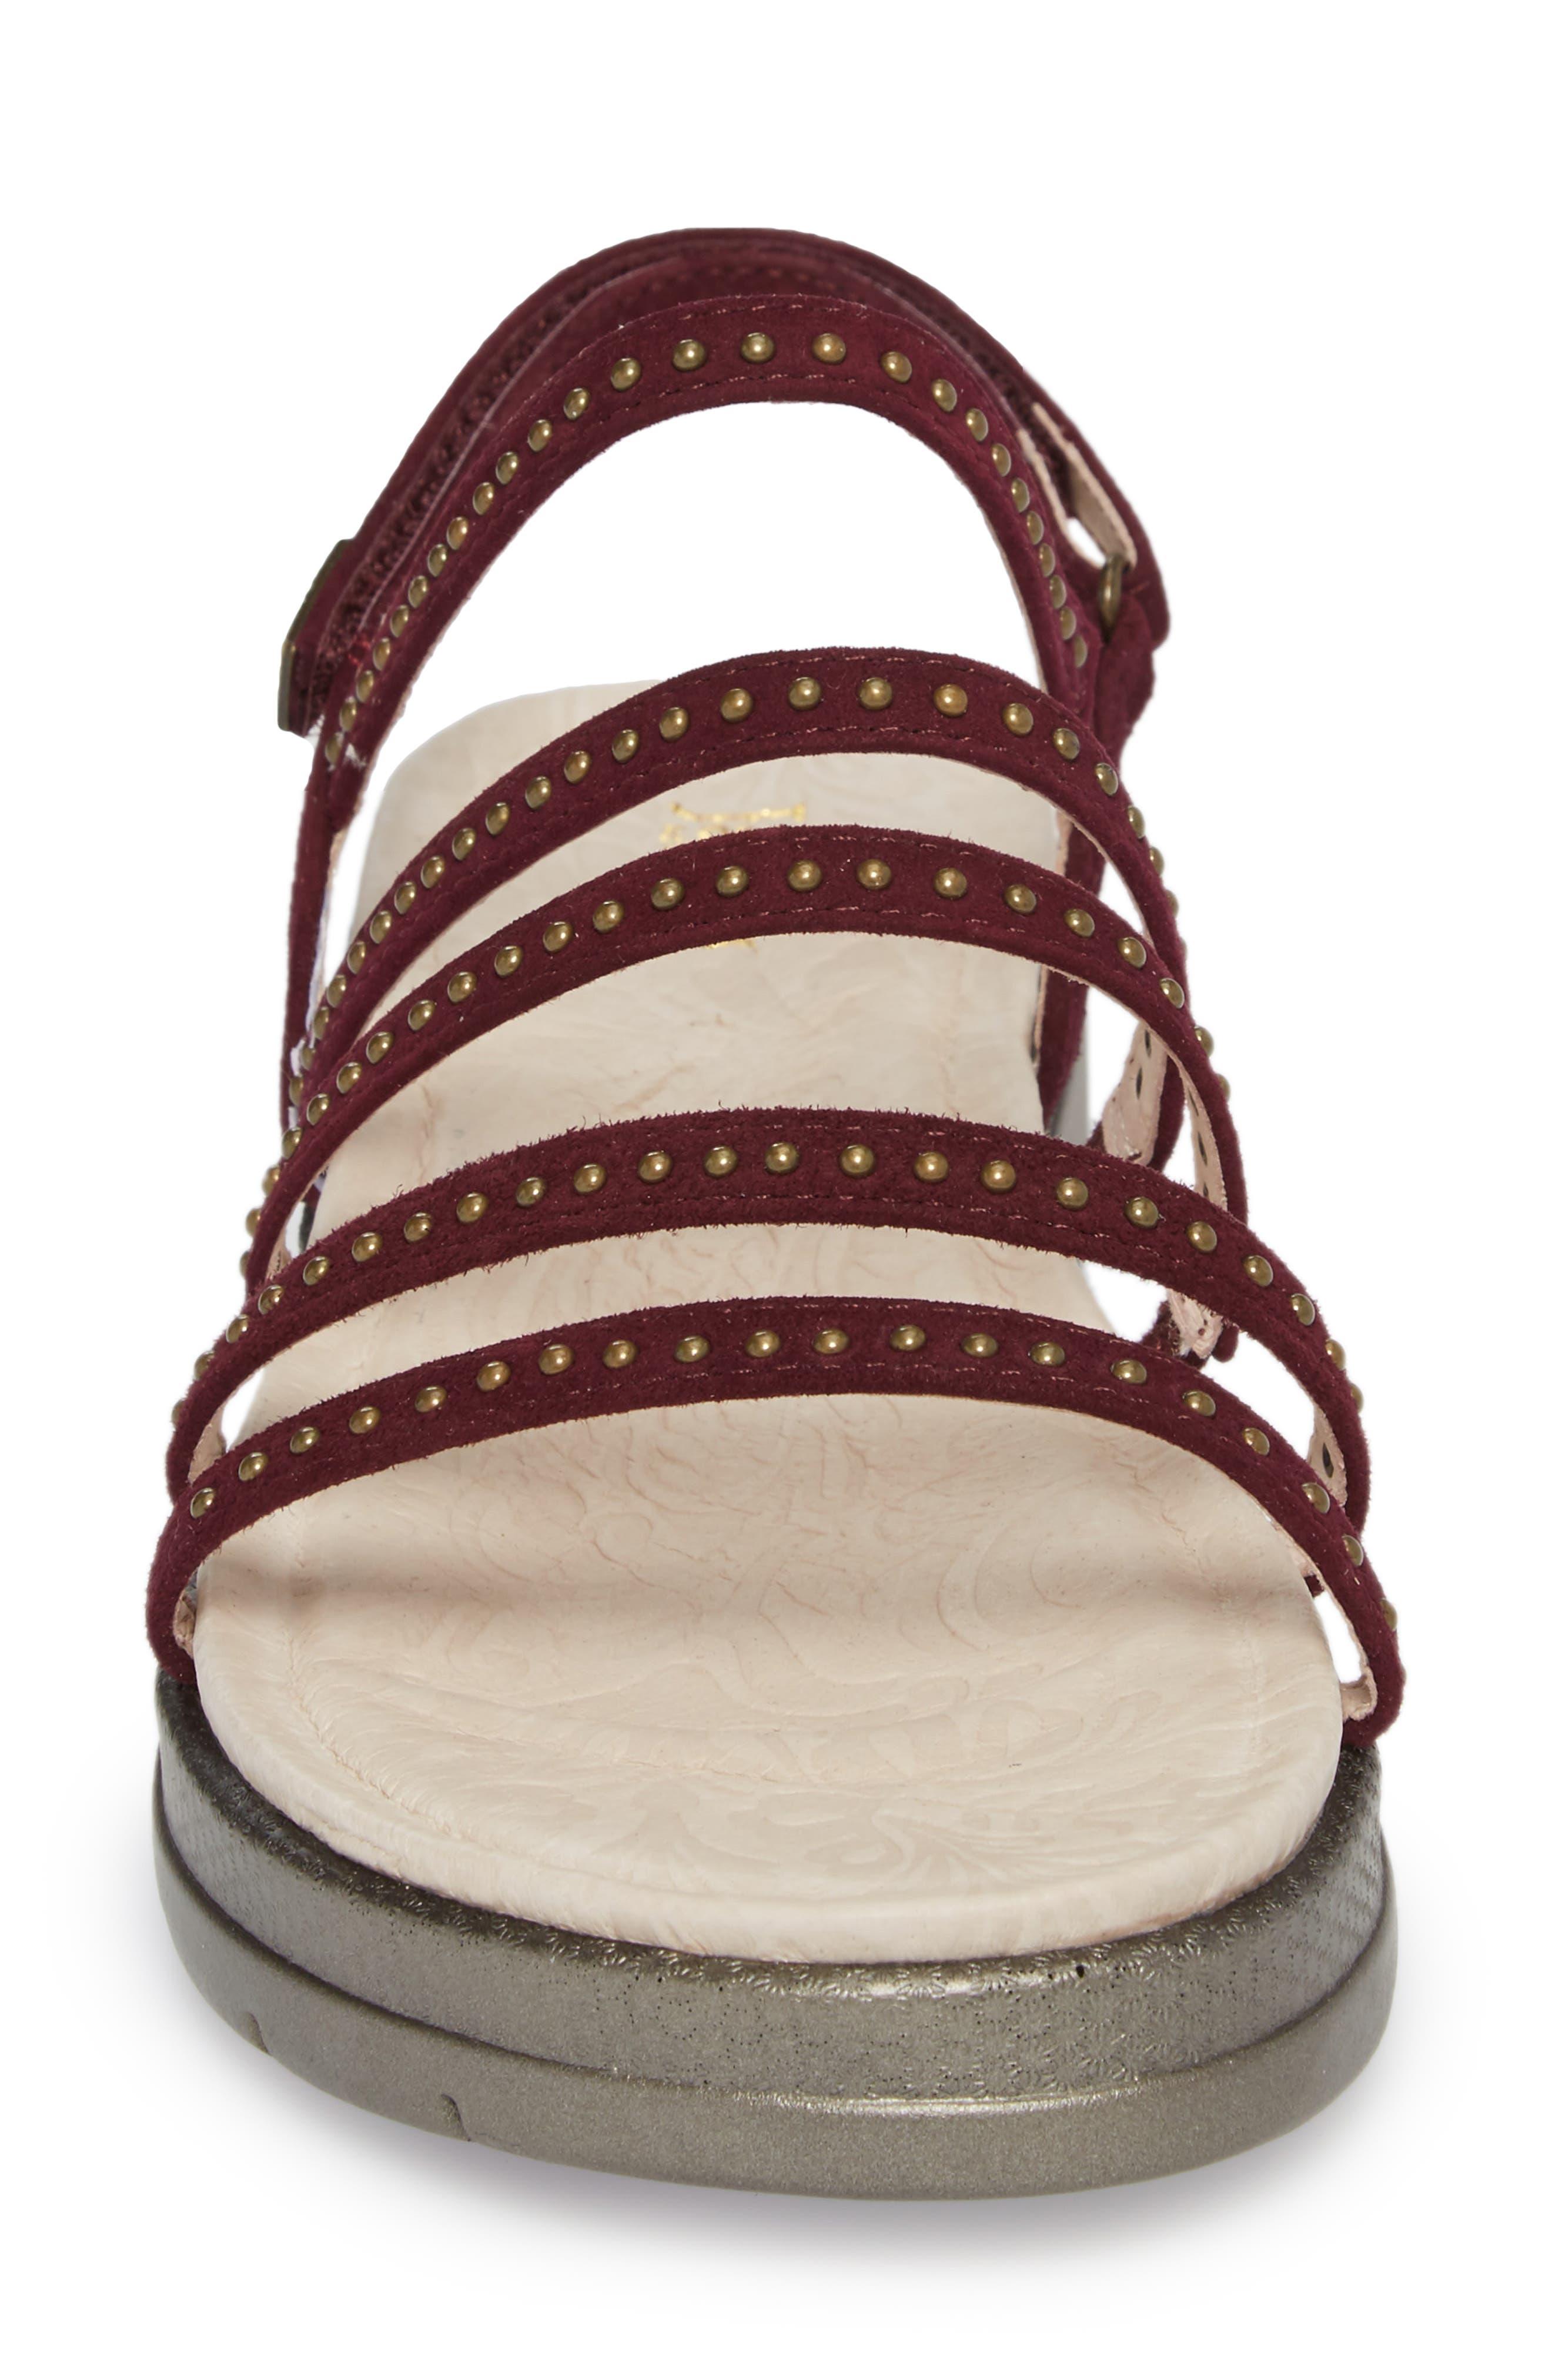 Elegance Studded Strappy Sandal,                             Alternate thumbnail 4, color,                             WINE SUEDE